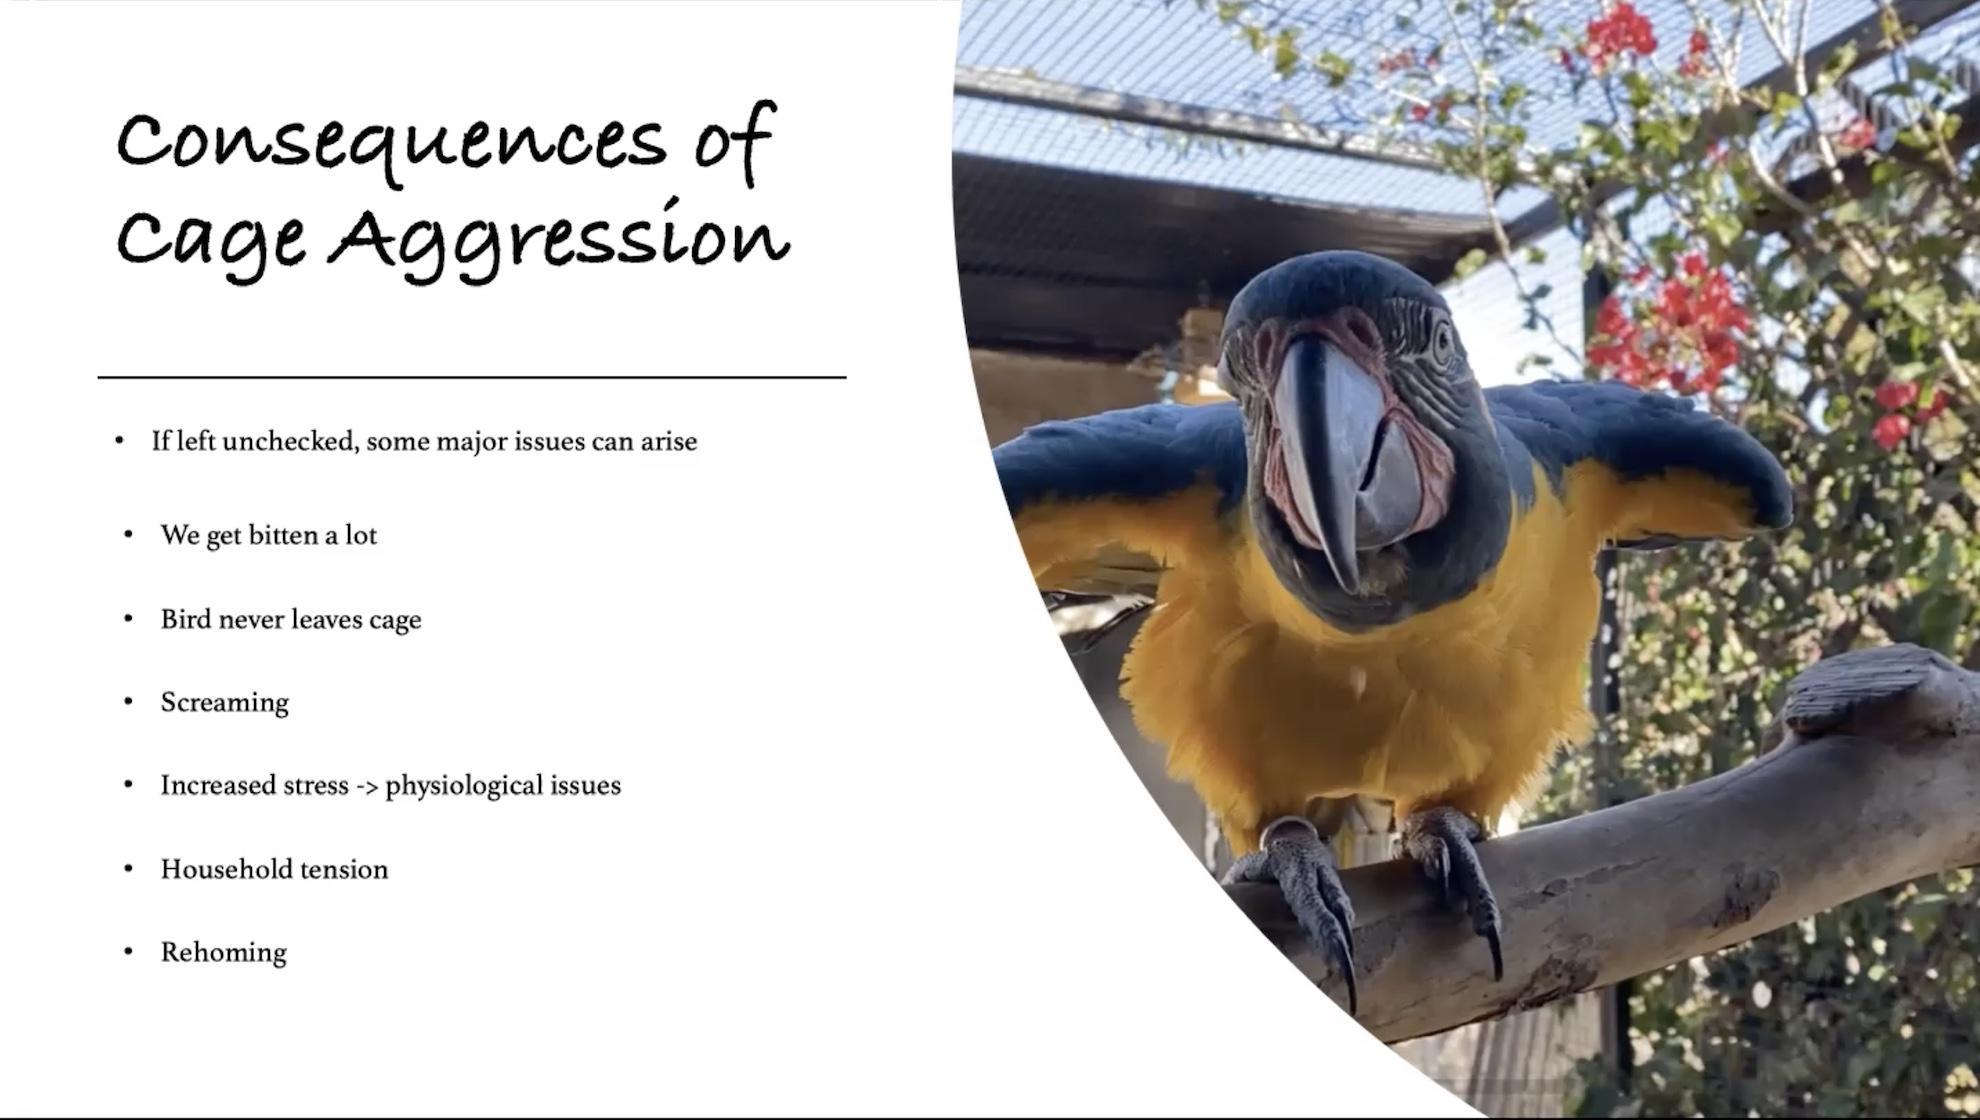 cage aggression webinar